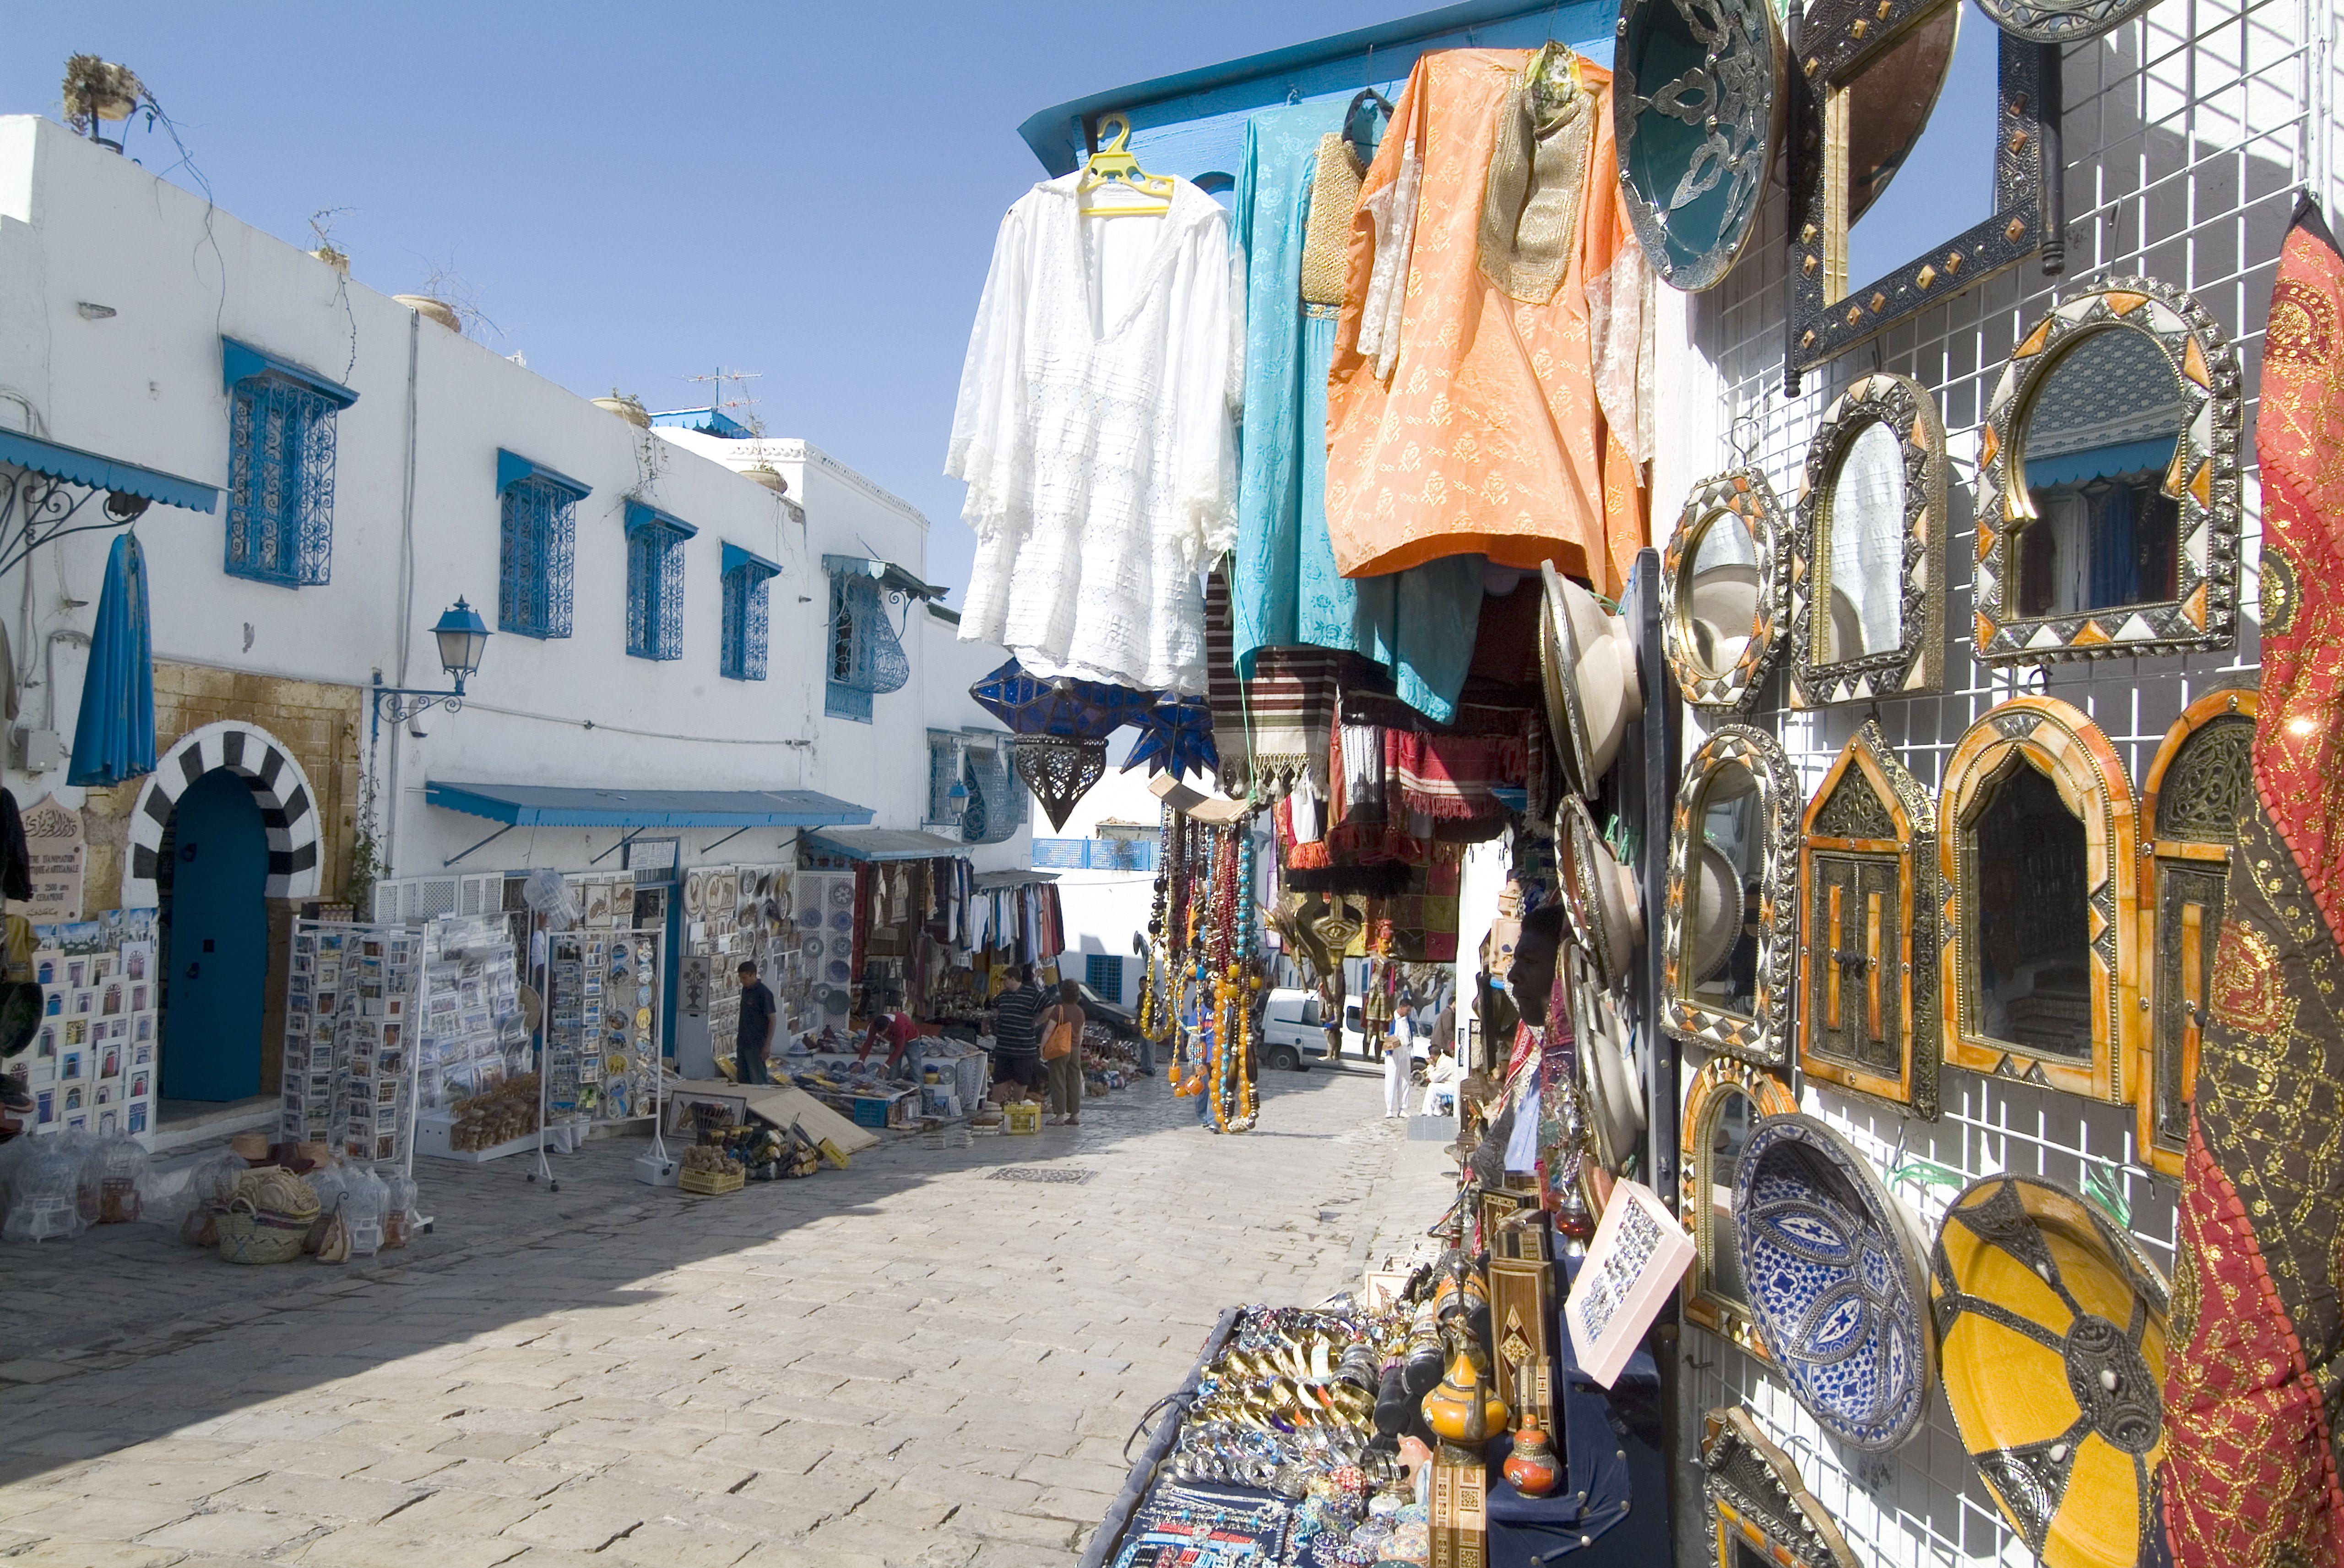 Sidi Bou Said street lined with merchants